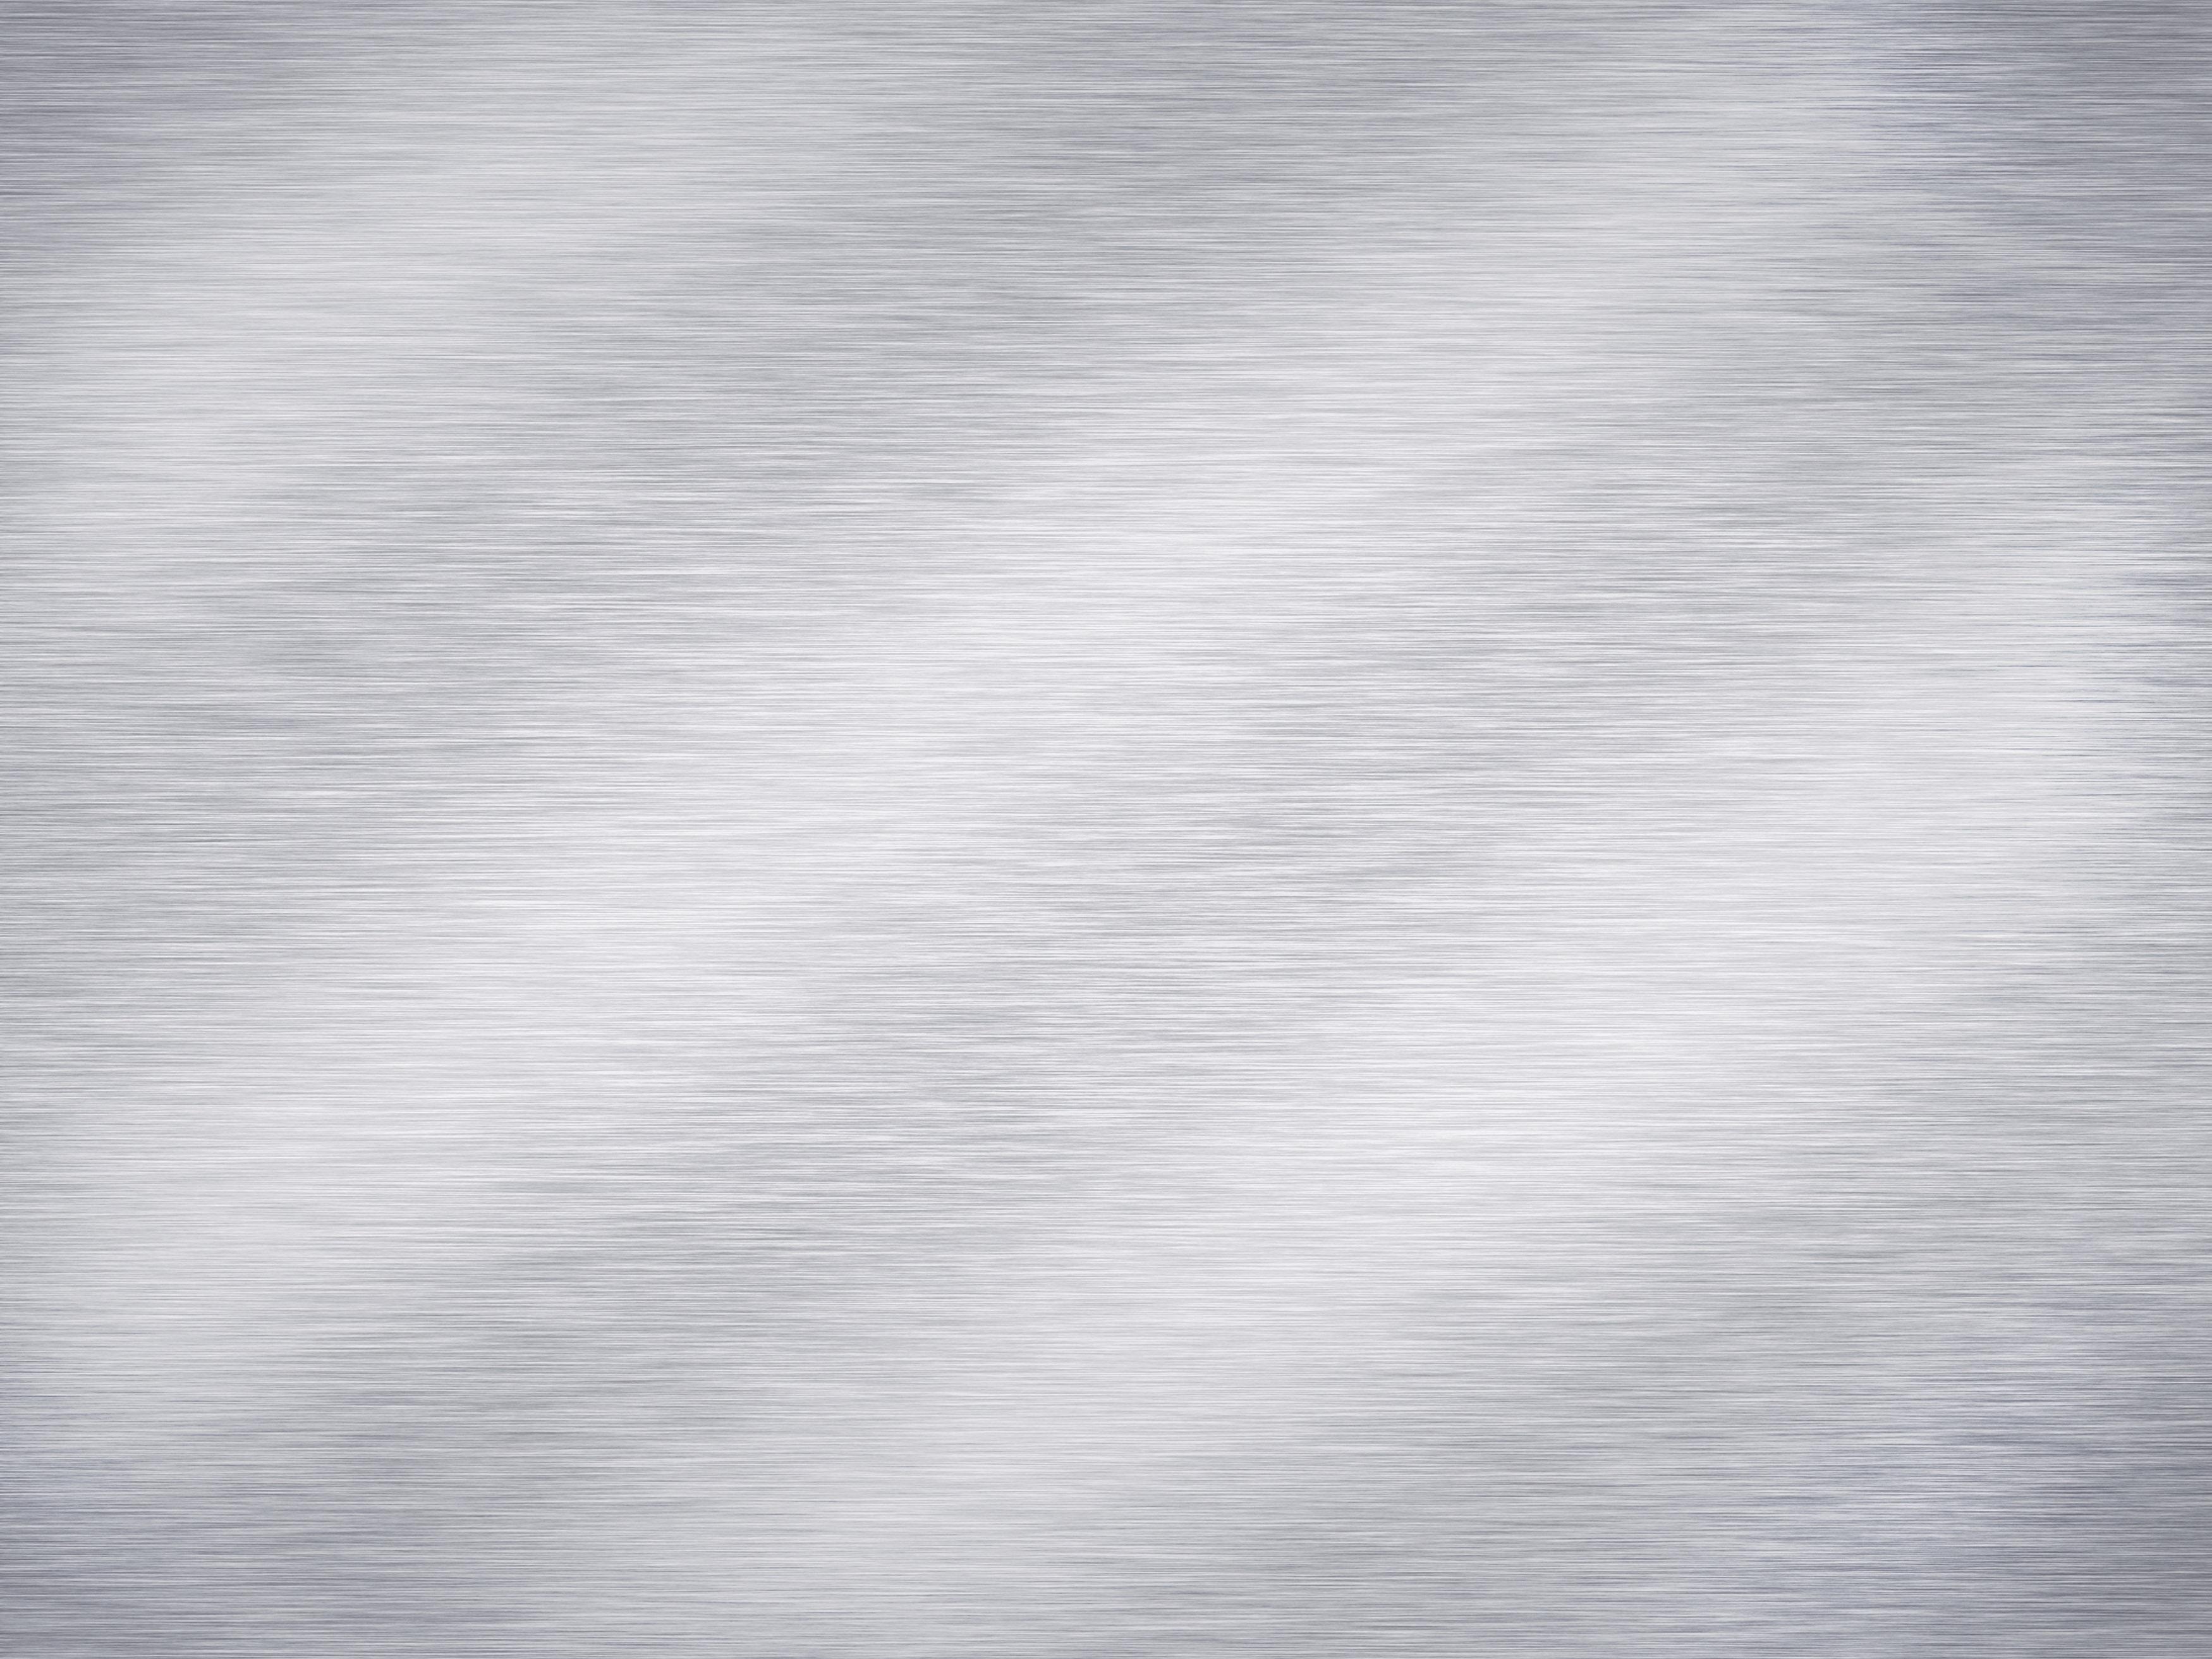 brushed metal texture 35